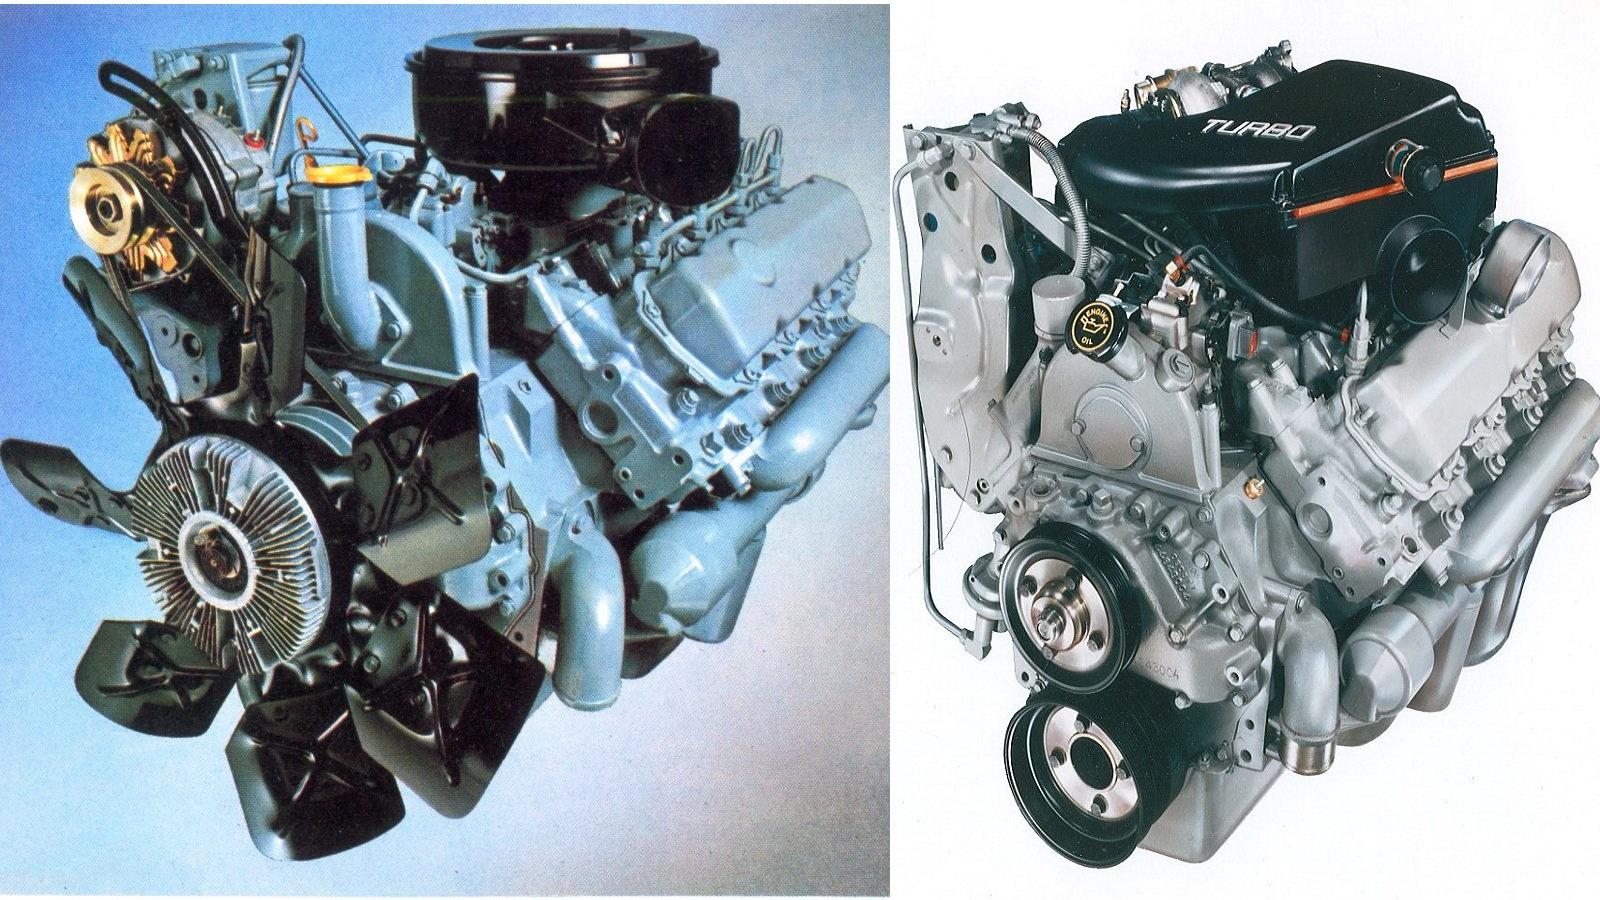 6. Ford IDI 6.9/7.3 Liter Diesel